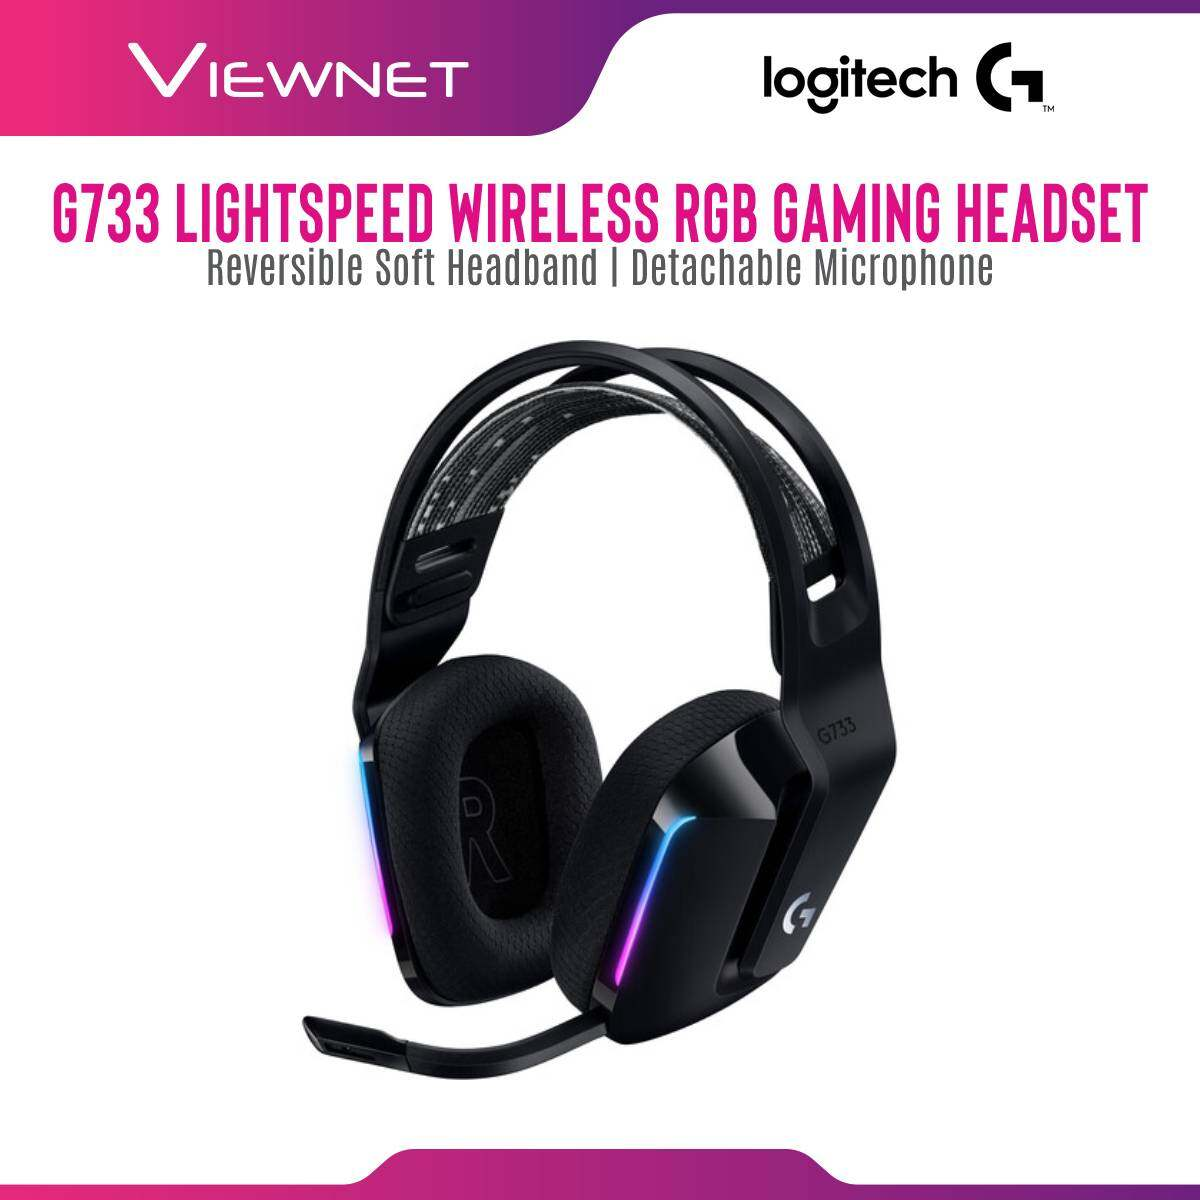 Logitech G733 Lightspeed Wireless RGB Gaming Headset with Lightspeed Wireless Technology, Lightsync RGB, Ultra Lightweight, Detachable Microphone, Pro-G 40mm Driver, Logitech G Hub Software Support